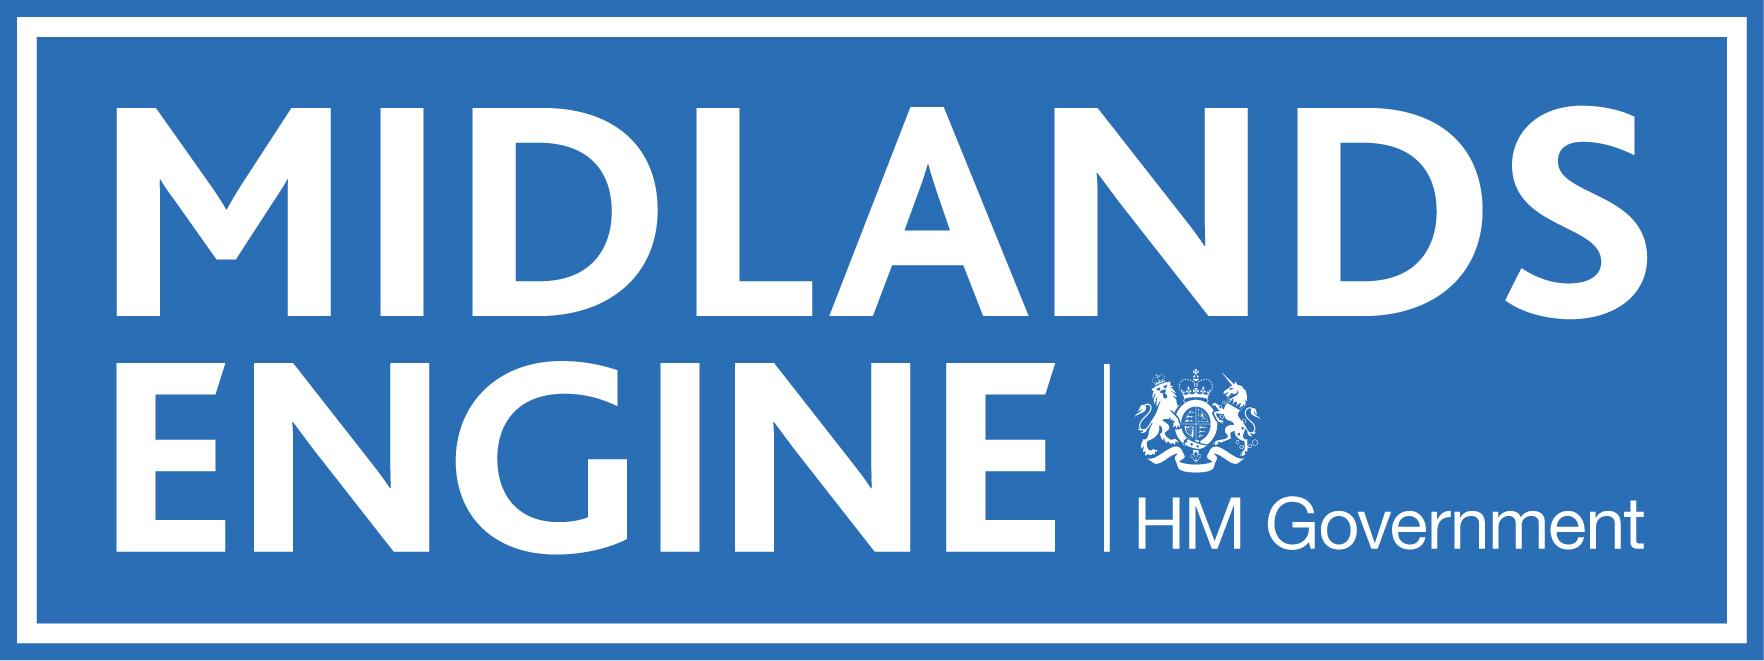 Midlands Engine logo